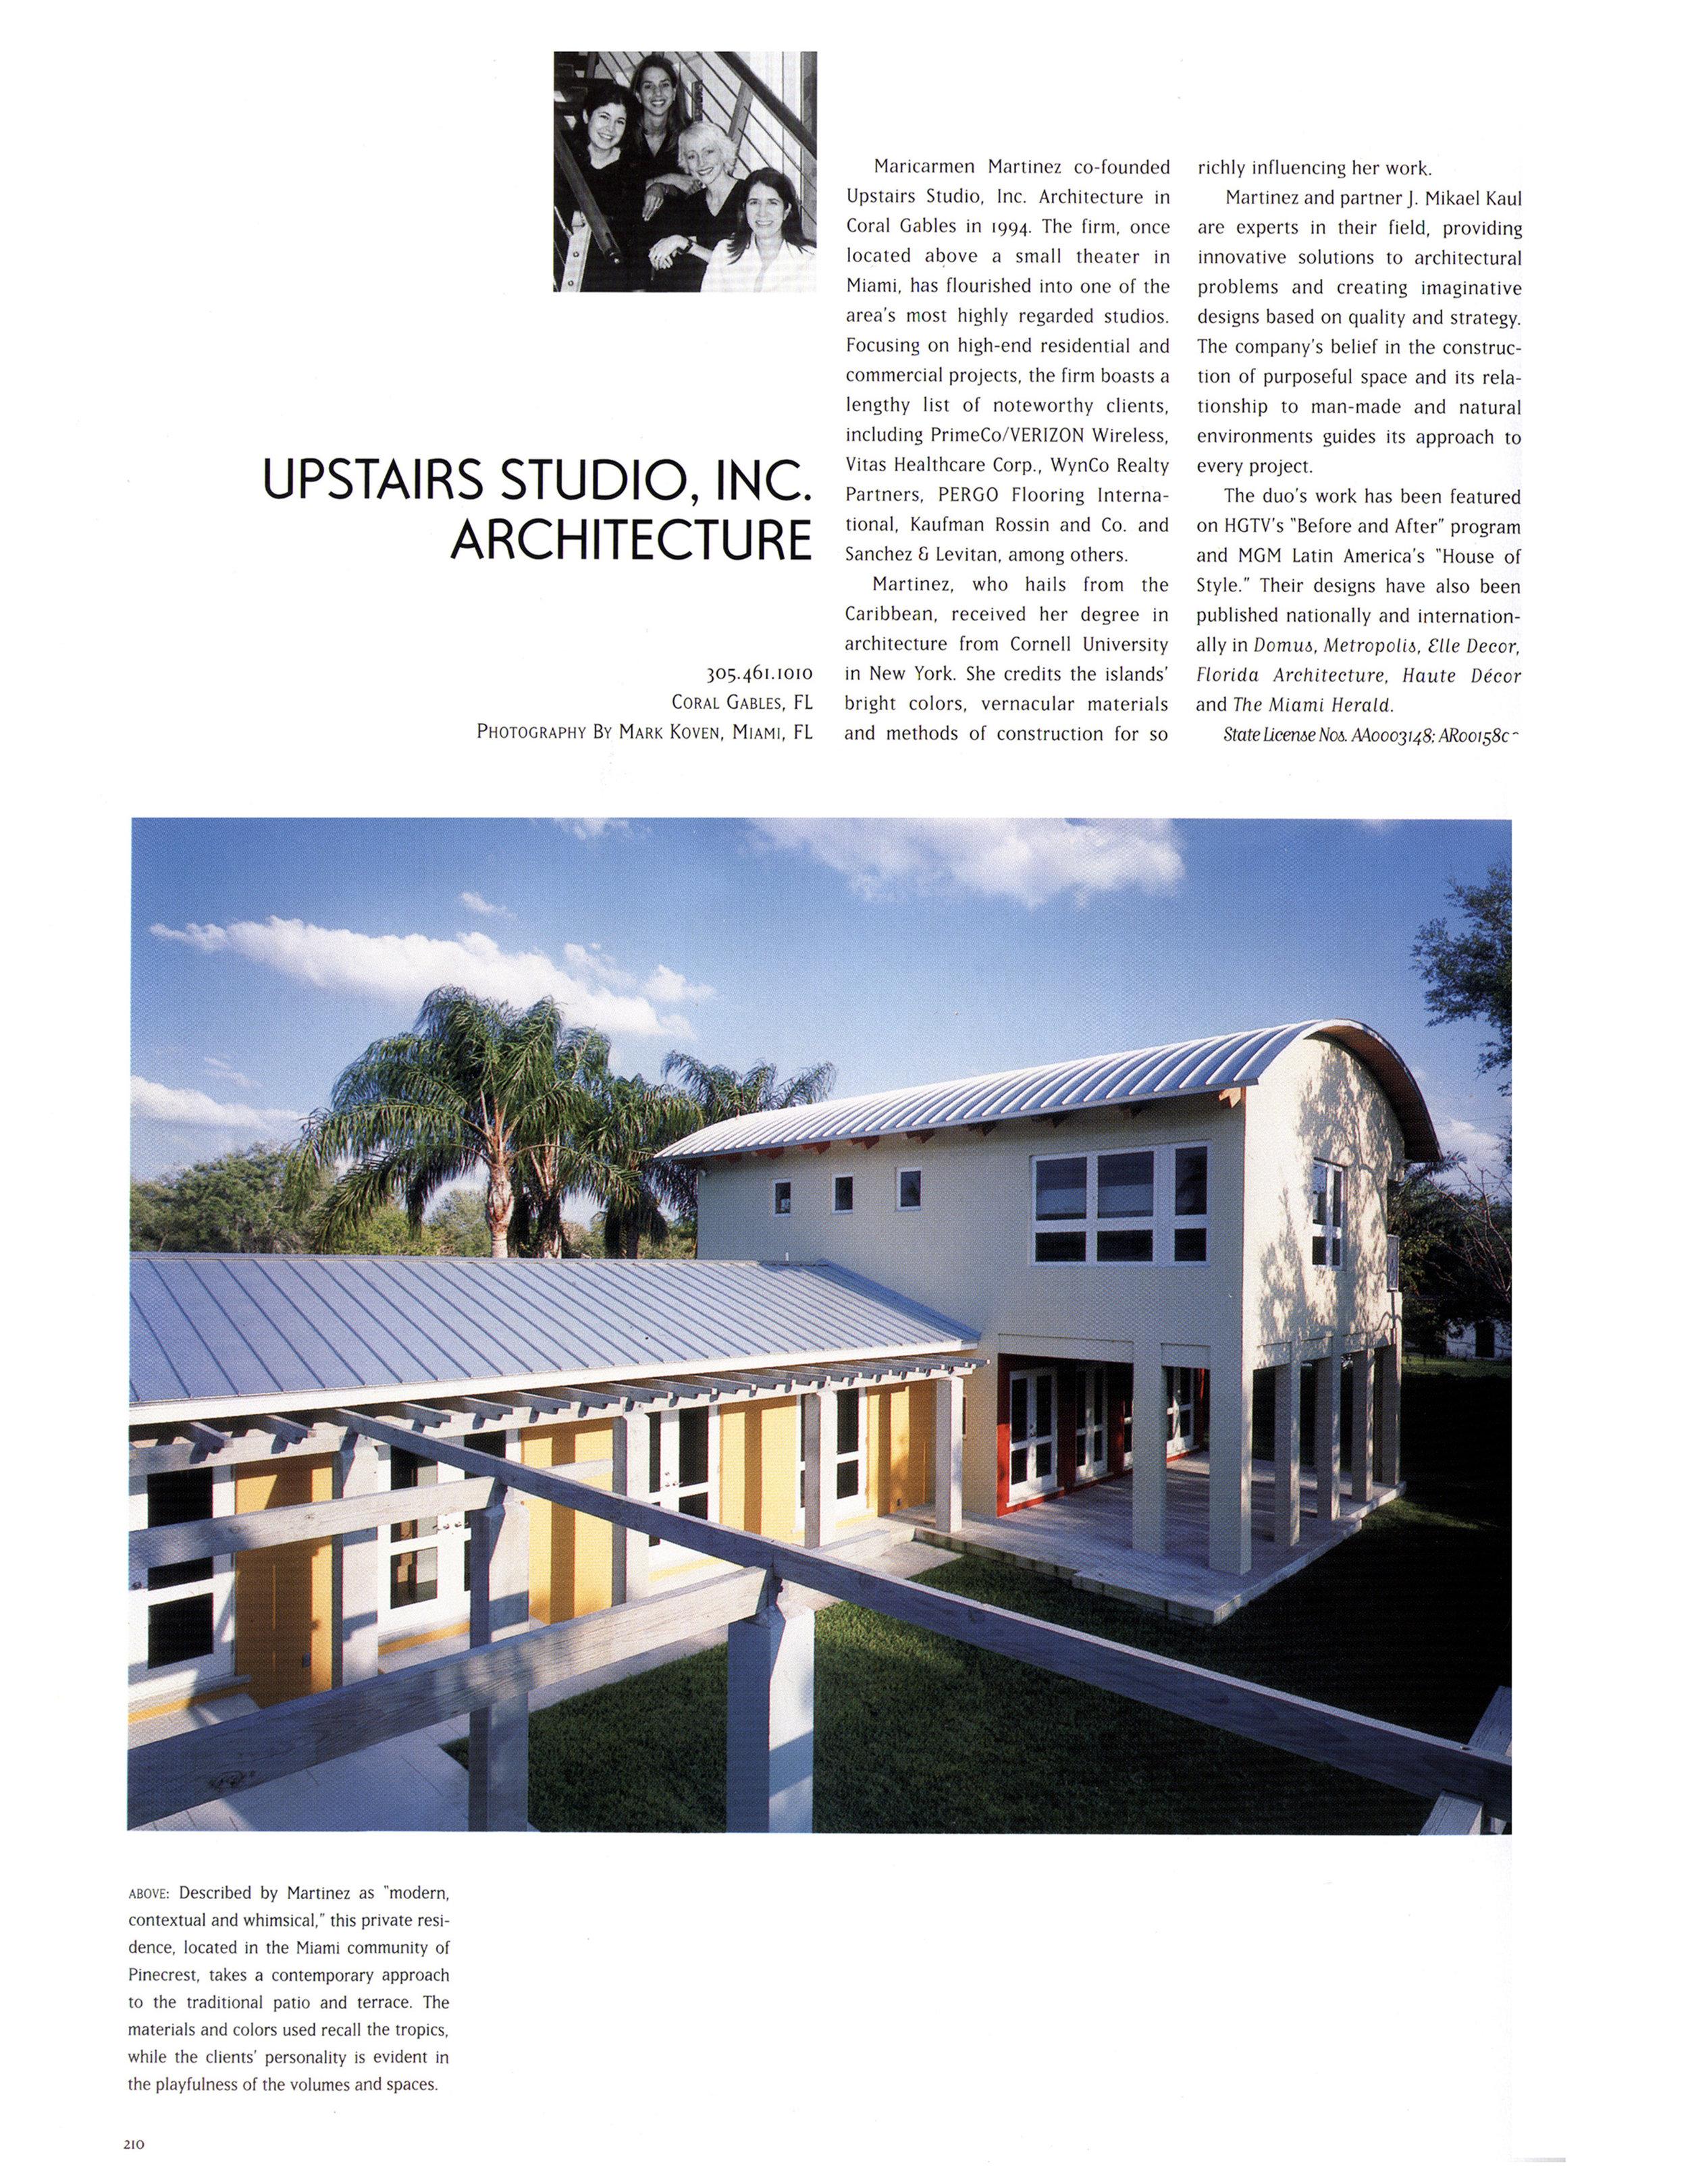 florida design book page 1.JPG